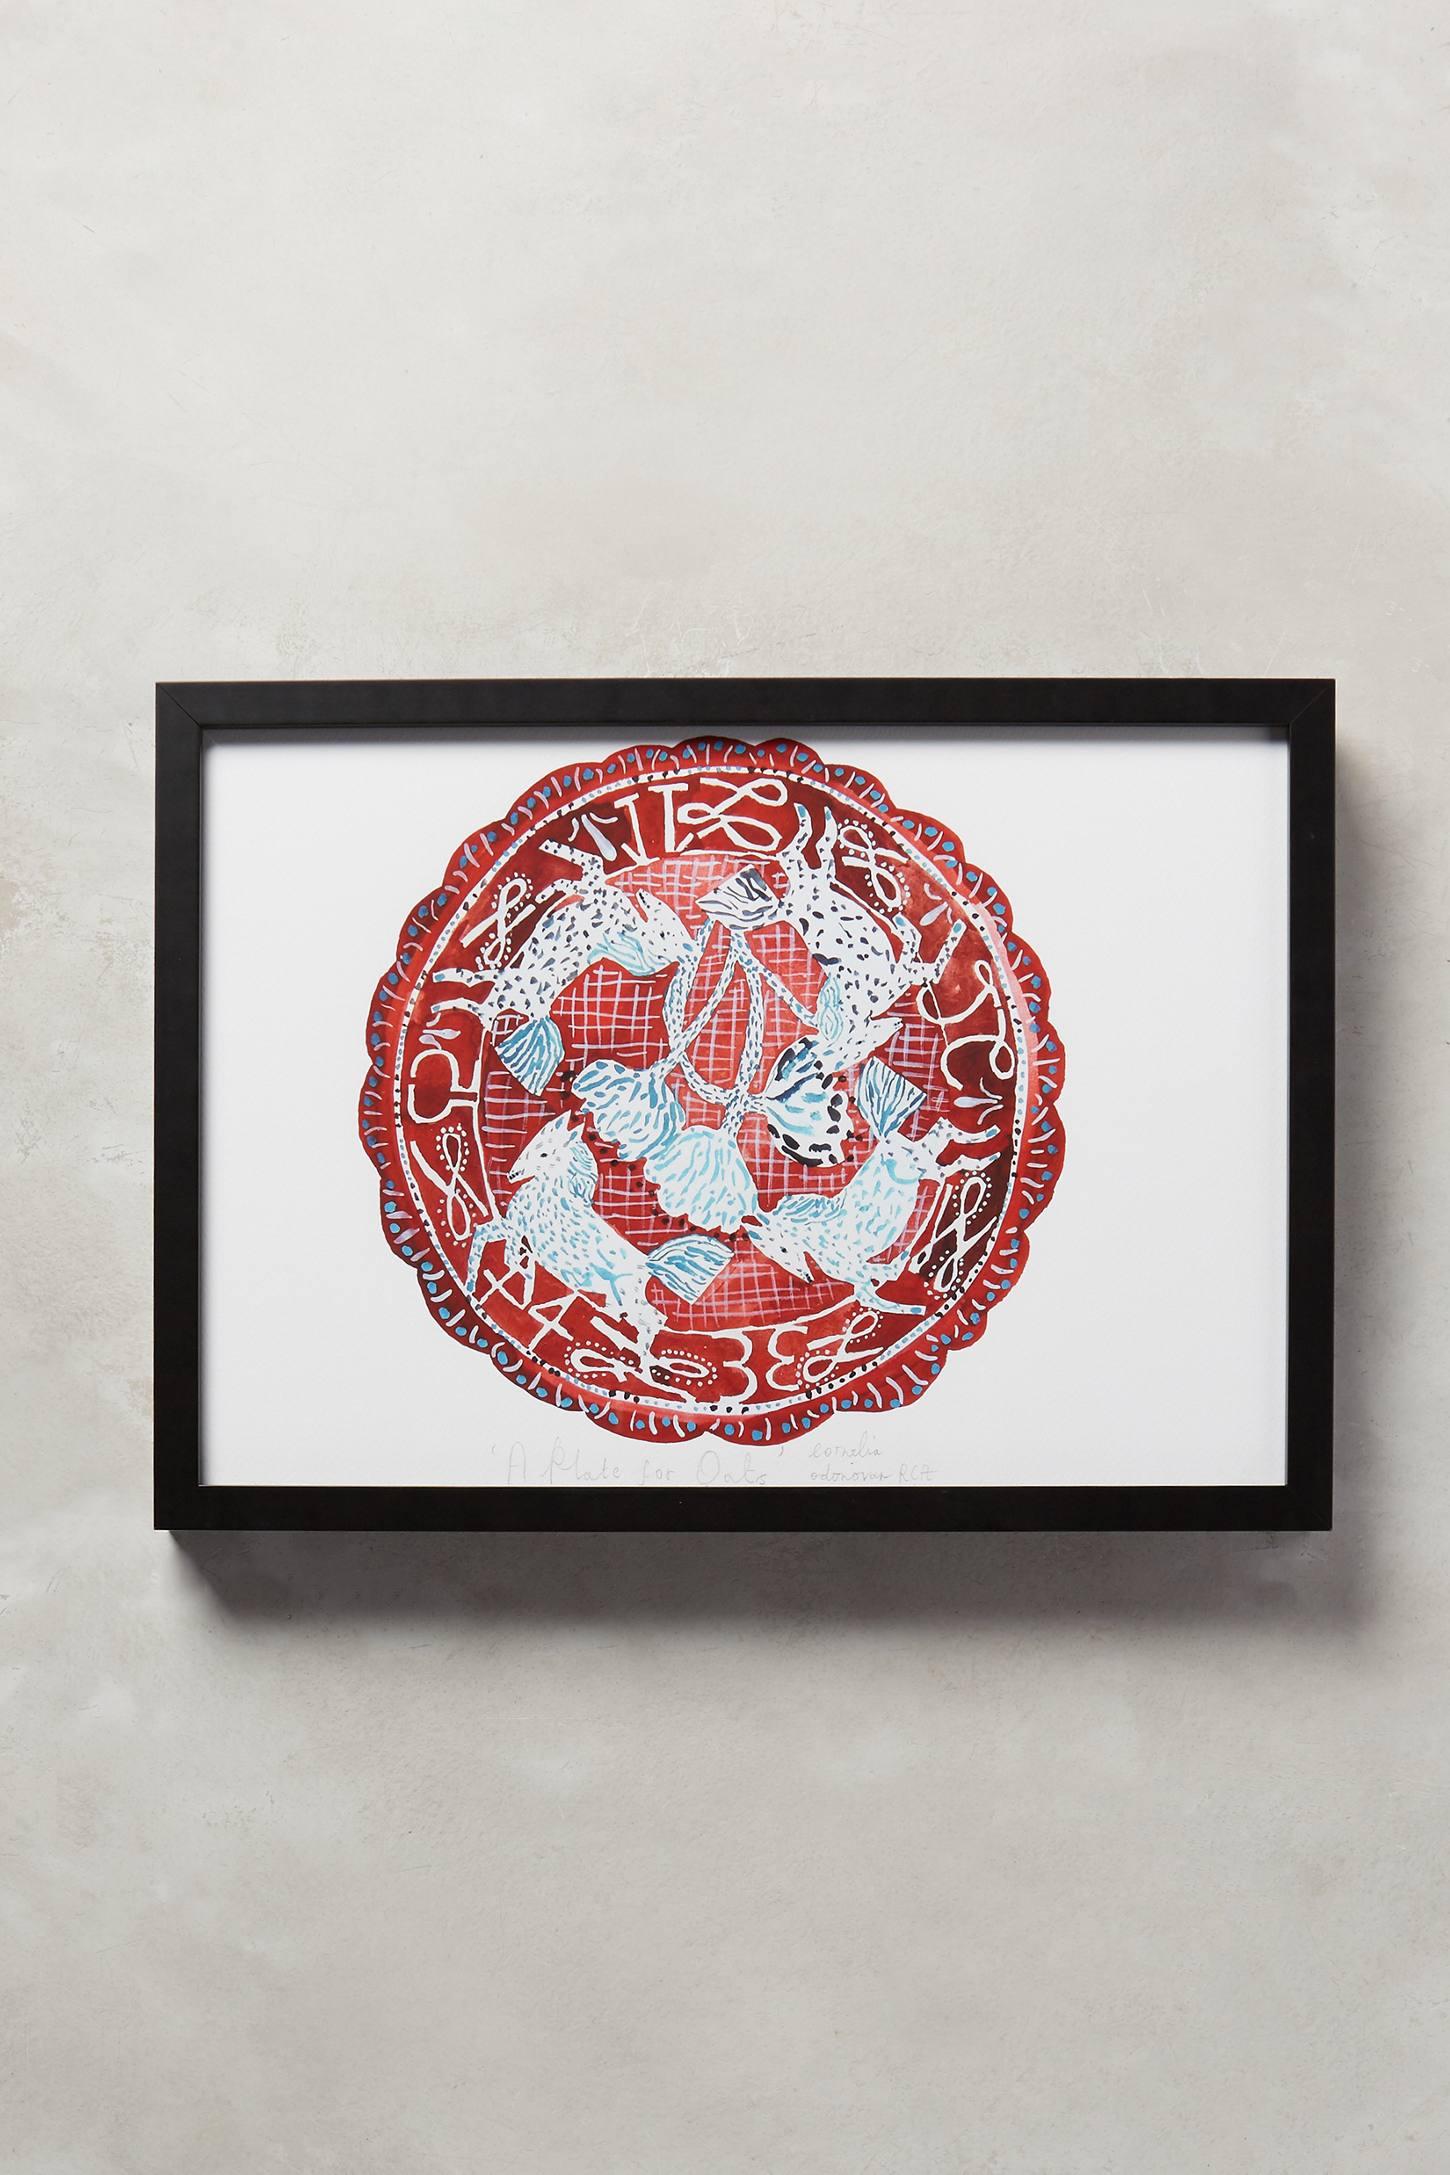 A Plate For Oats Wall Art